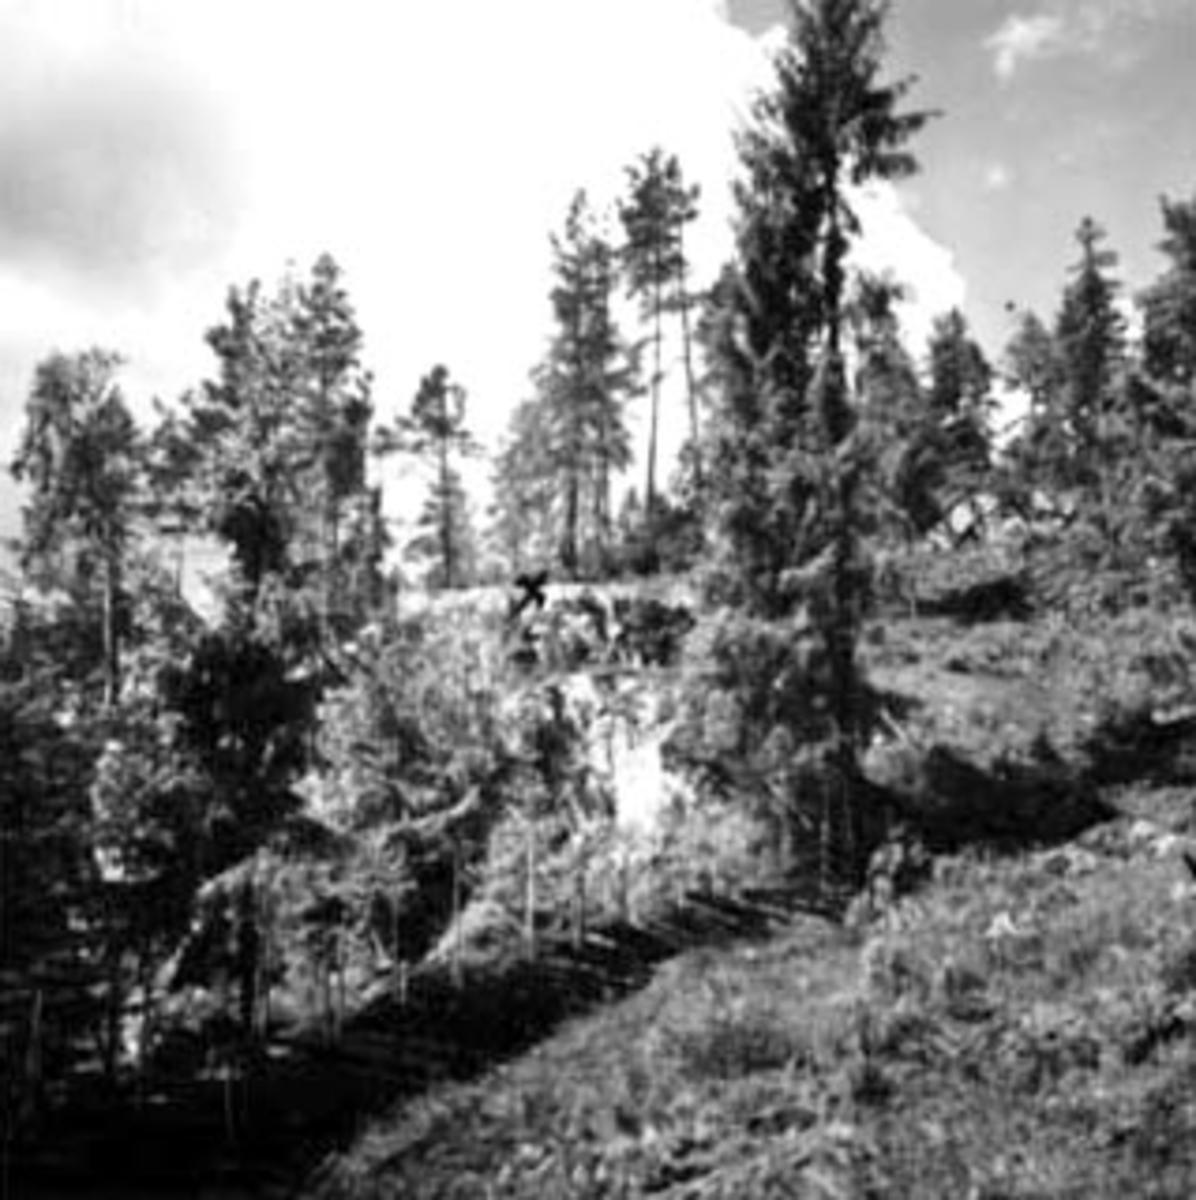 Domstuguberget, prestergardsskogen, bygdeborg fra folkevandringstiden. Oppmålt av Anders Hagen fra universitetets oldsaksamling i juni 1943.